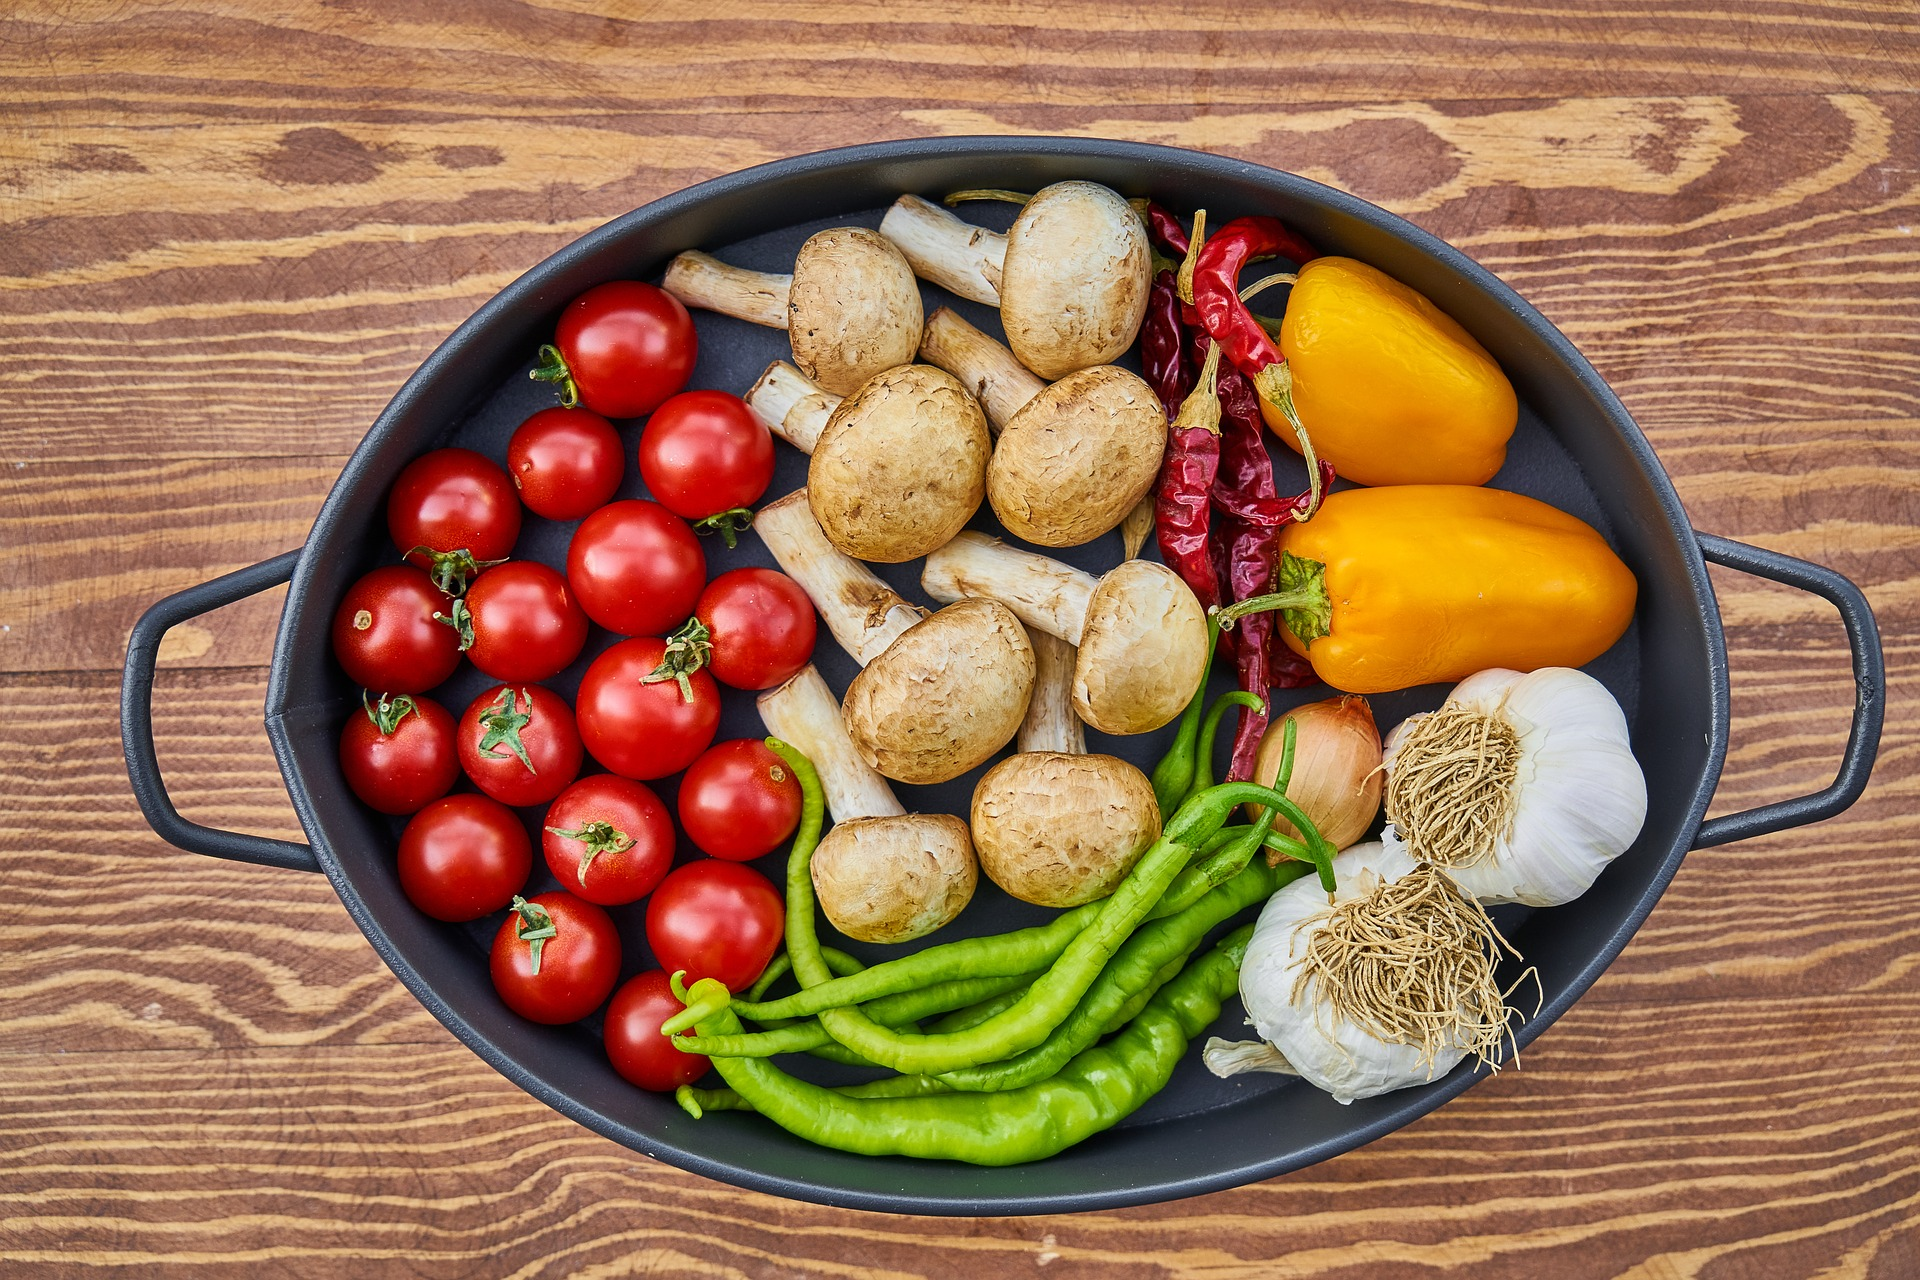 utilizare resturi - sfatulparintilor.ro - pixabay_com - tomato-2776735_1920